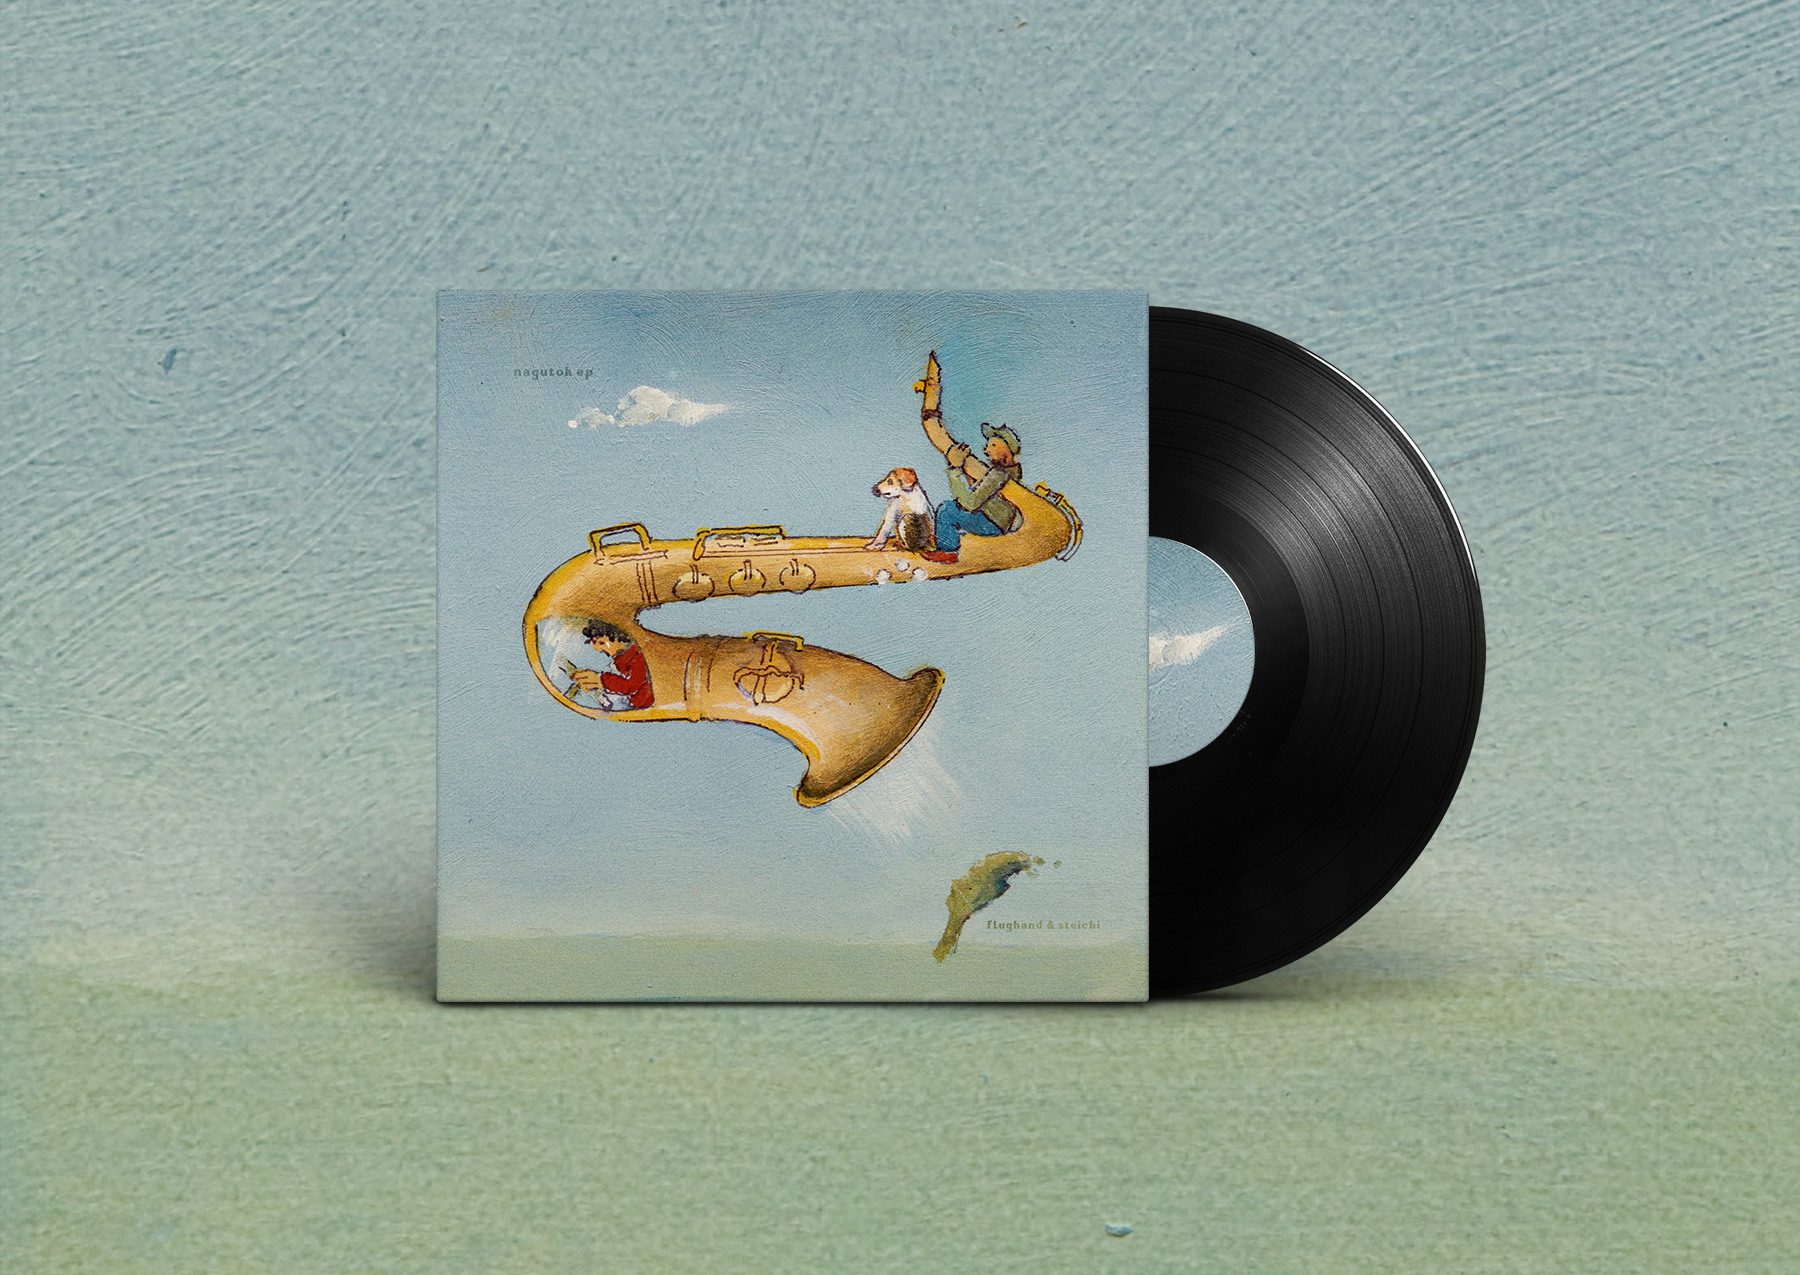 flughand-steichi-vinyl-nagutok-ep-typo-design-by-max-duchardt-ma-a-x-